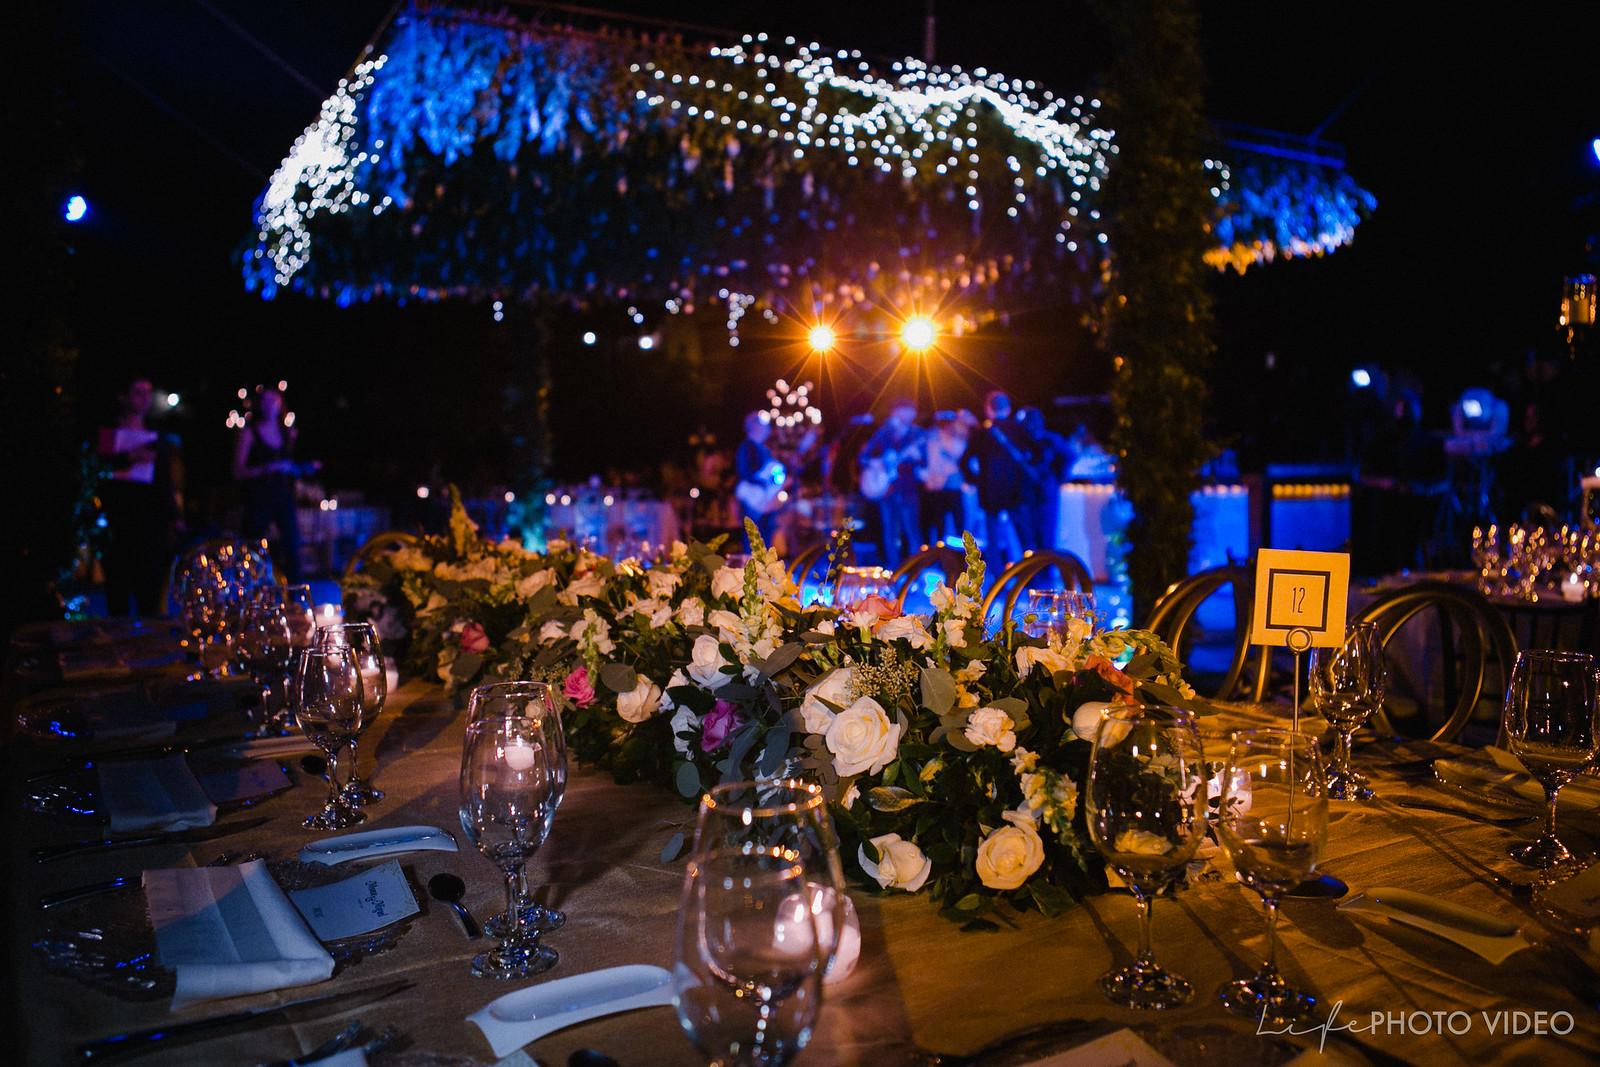 LifePhotoVideo_Boda_Guanajuato_Wedding_0049